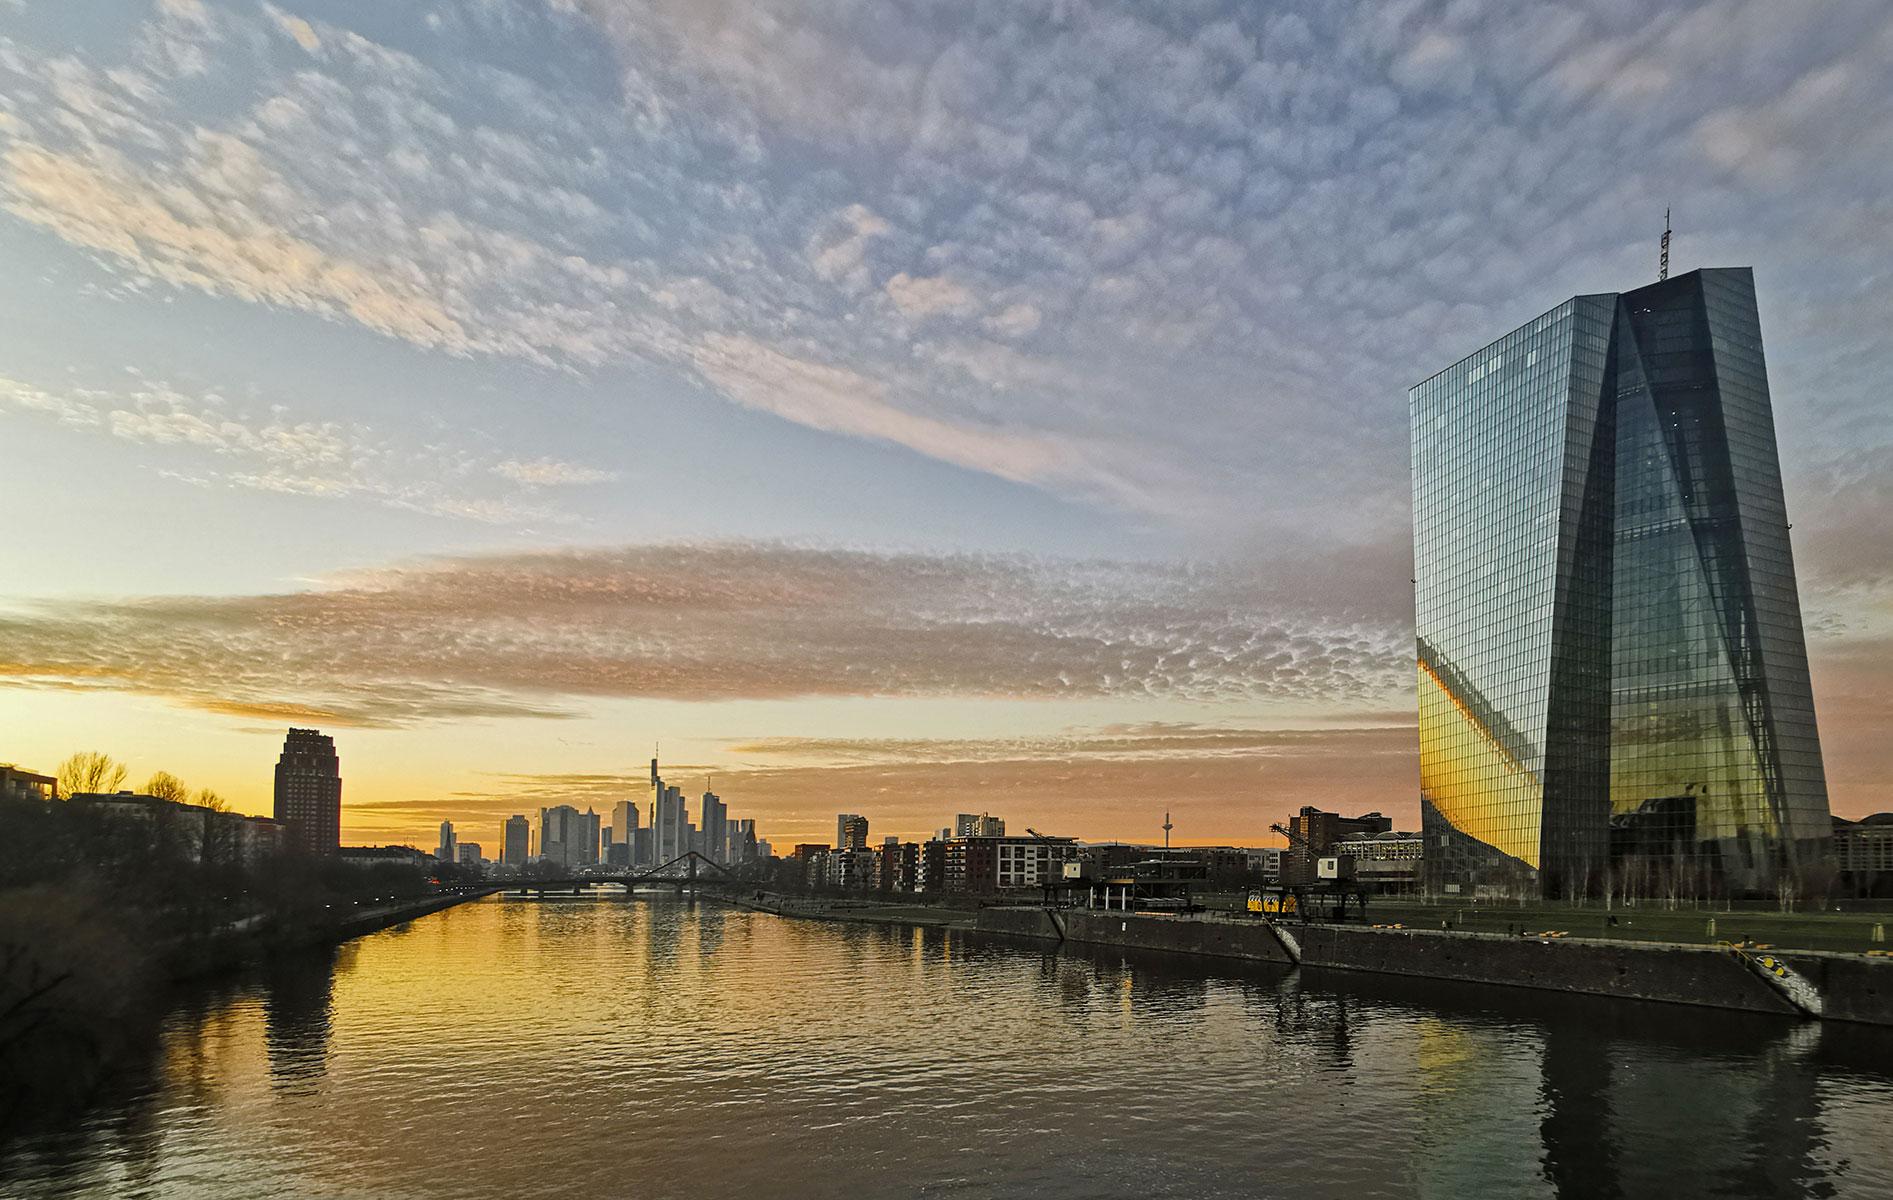 Stockfoto Frankfurt kostenfrei - Foto kostenfrei EZB - Foto EZB kostenlos Download - Frankfurt am Main Sonnenuntergang - Foto Nr. 602-665-756